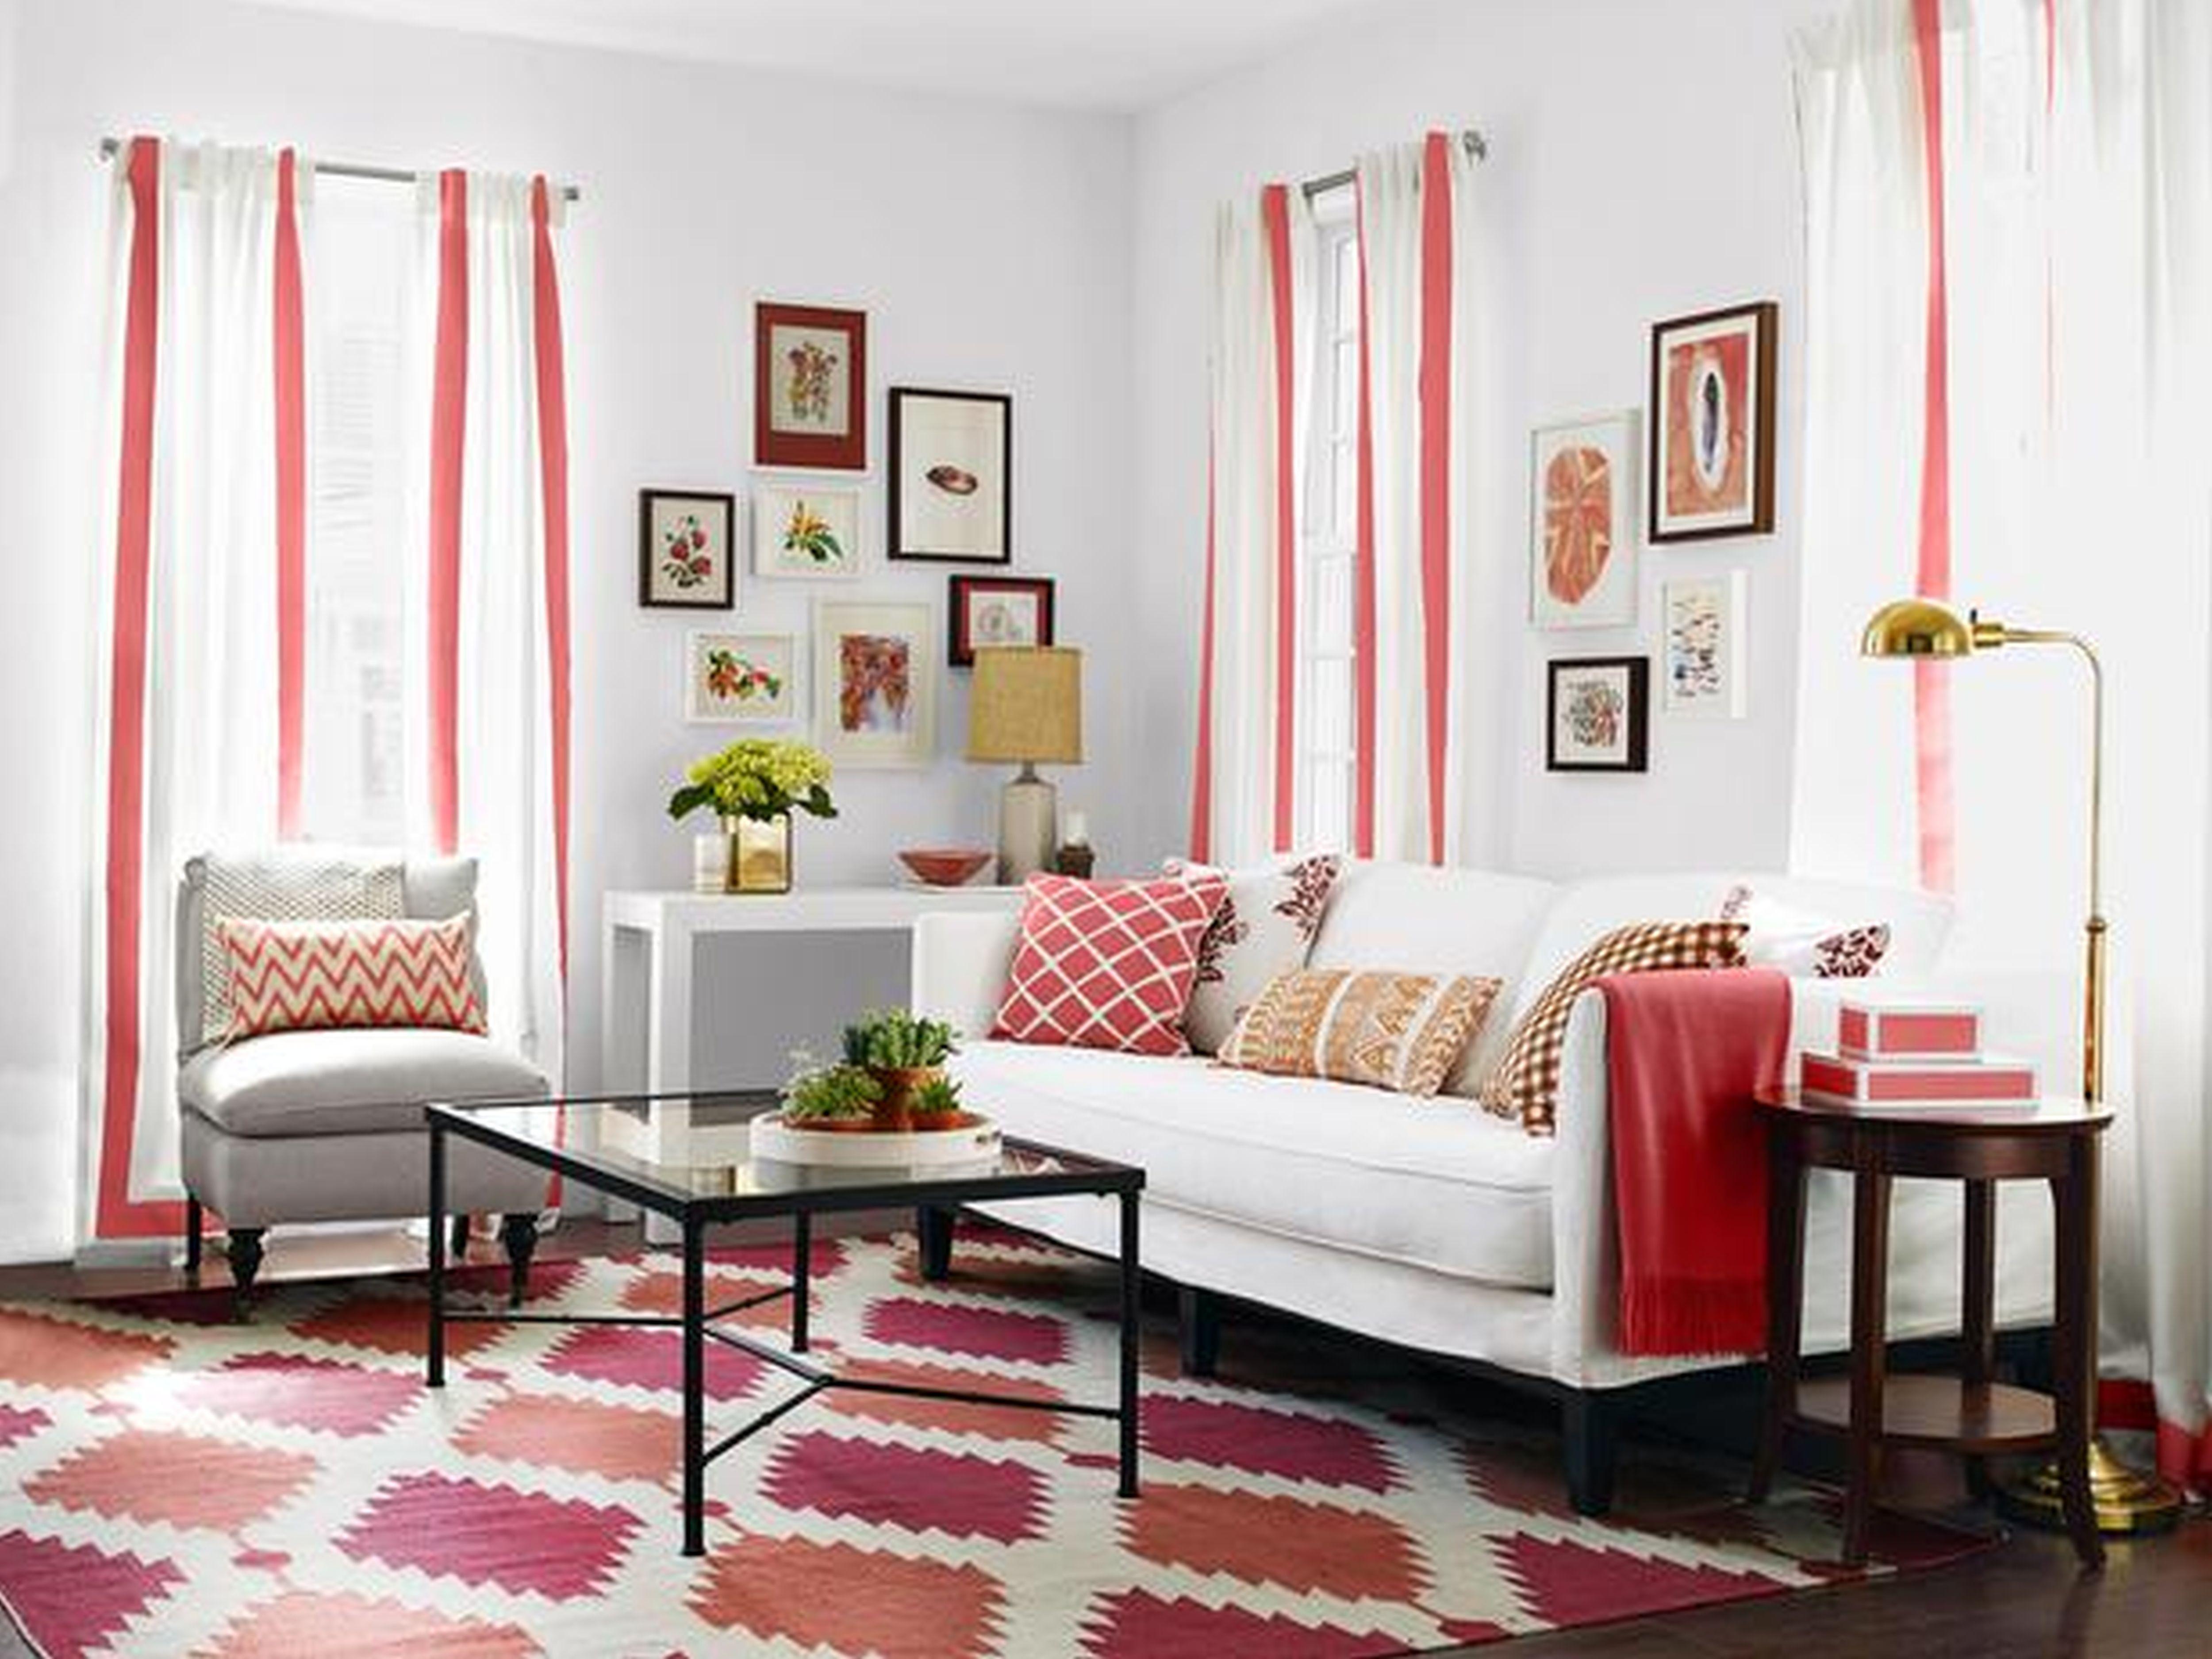 Living Room Design Ideas (View 9 of 10)